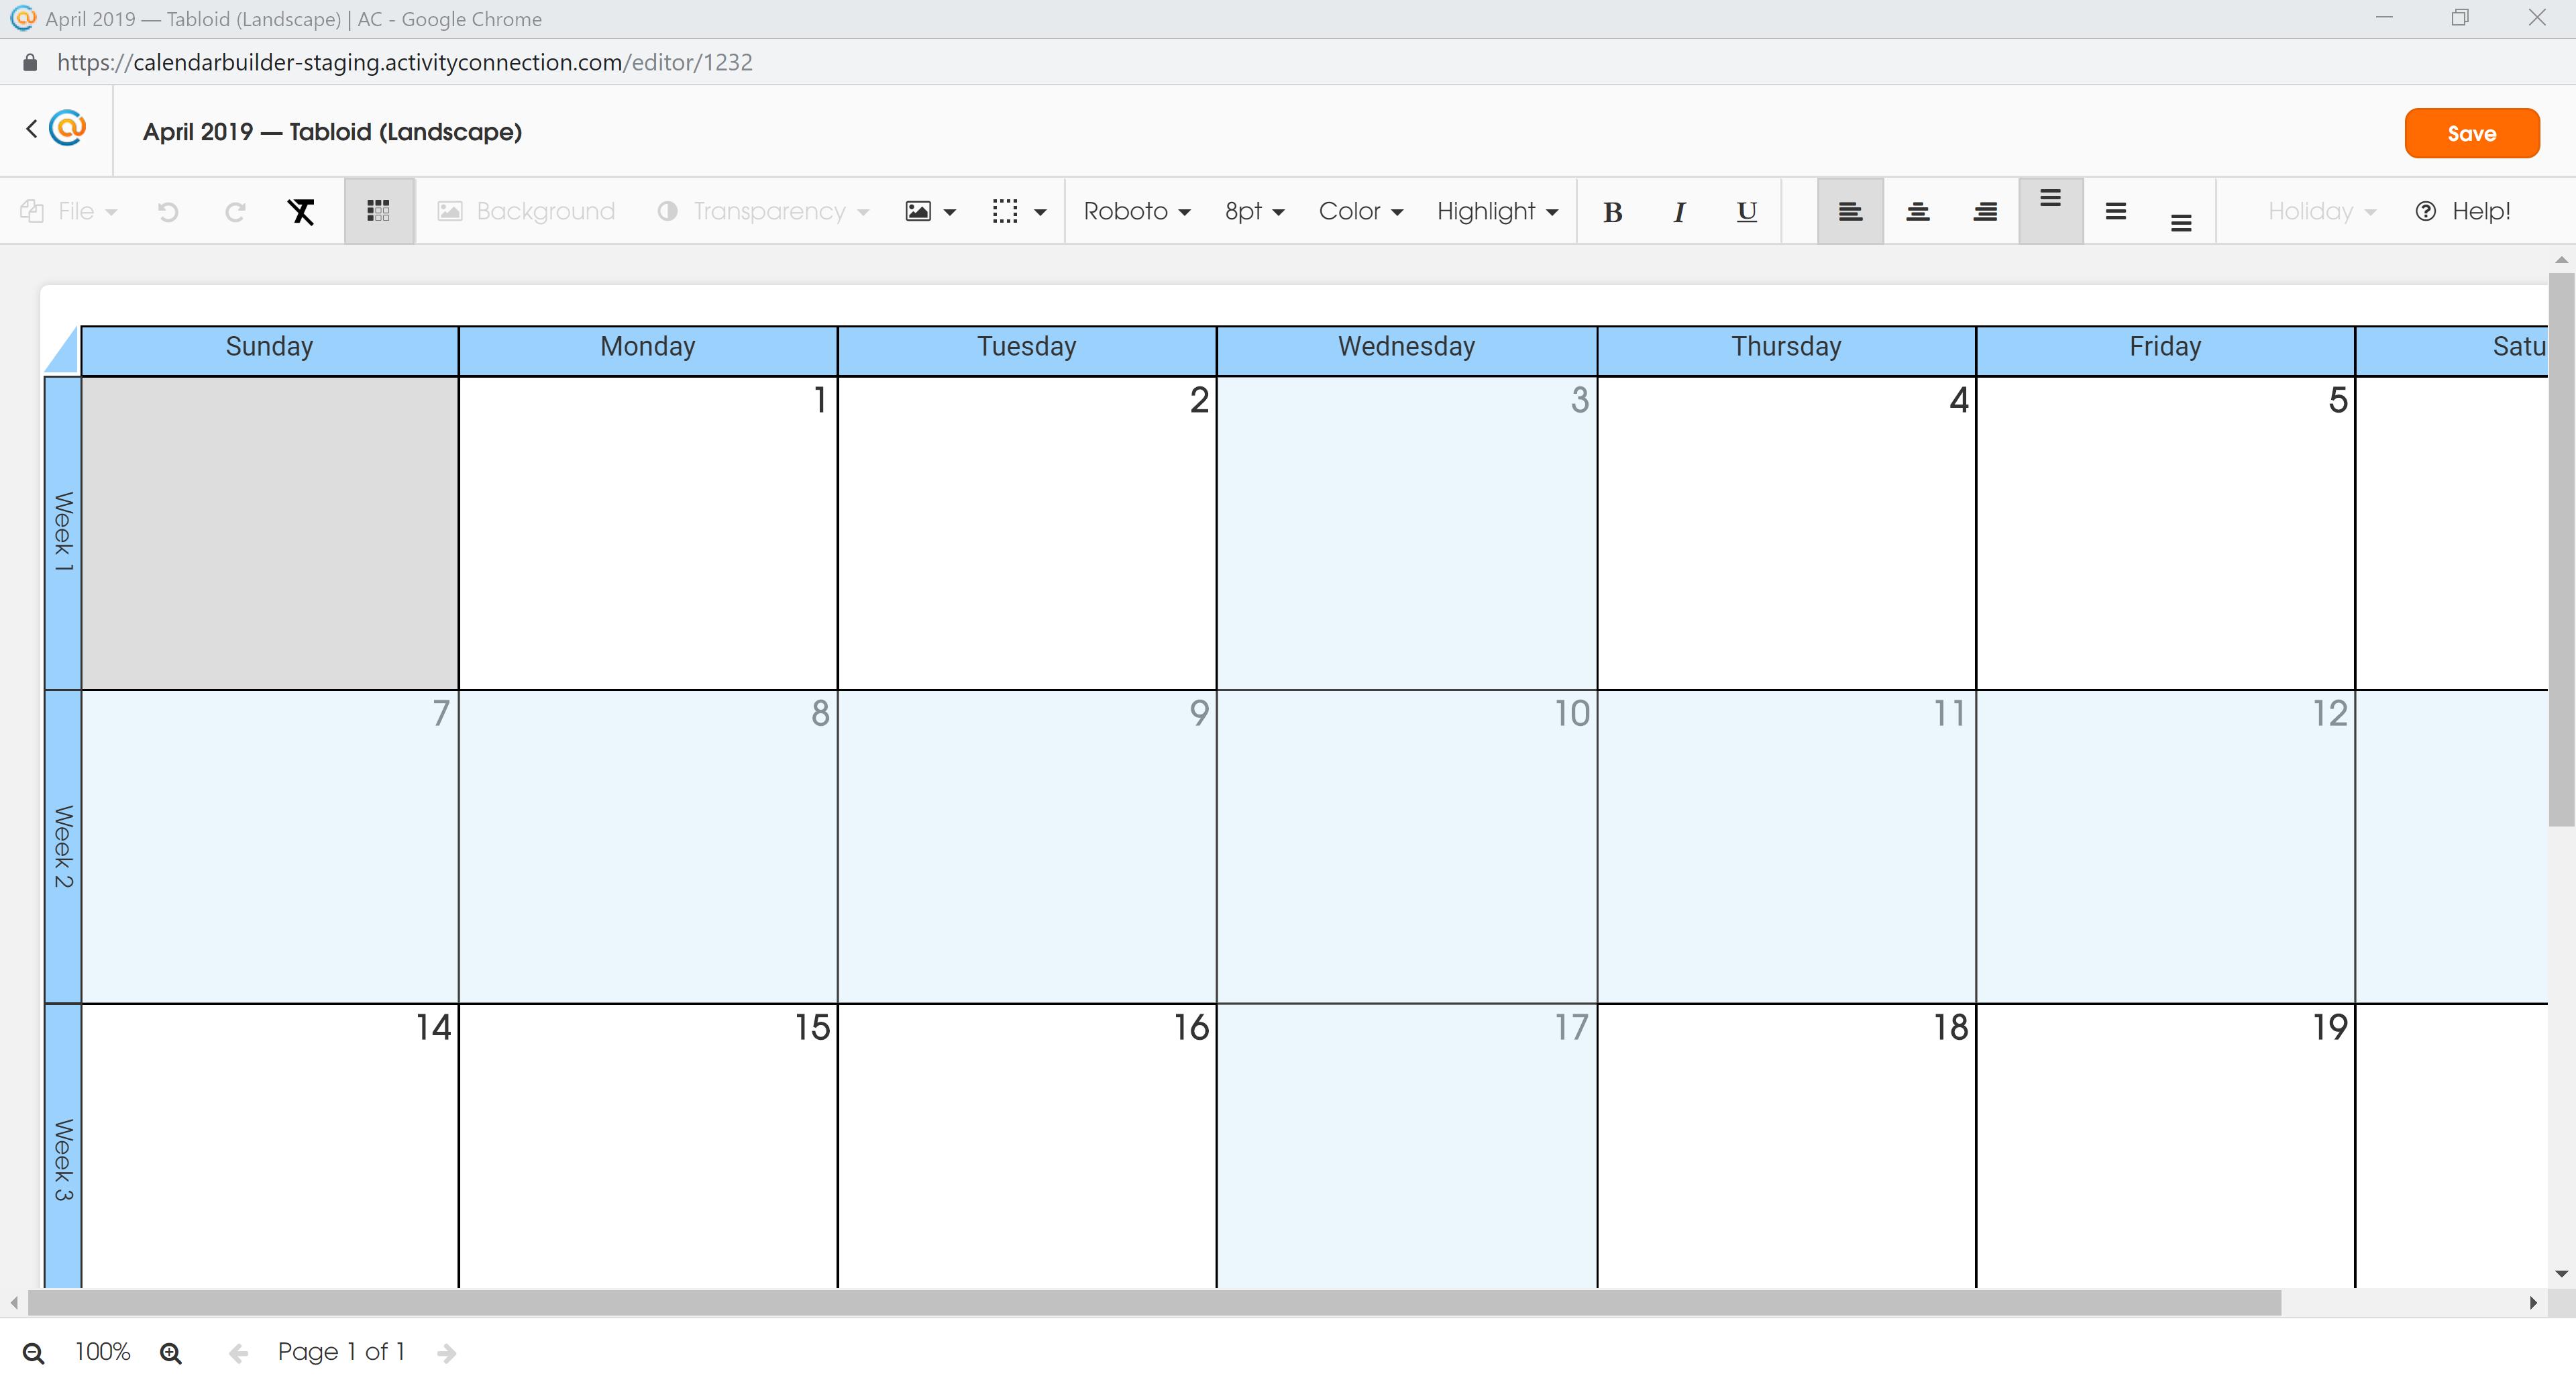 Calendar - Row and Column Selected